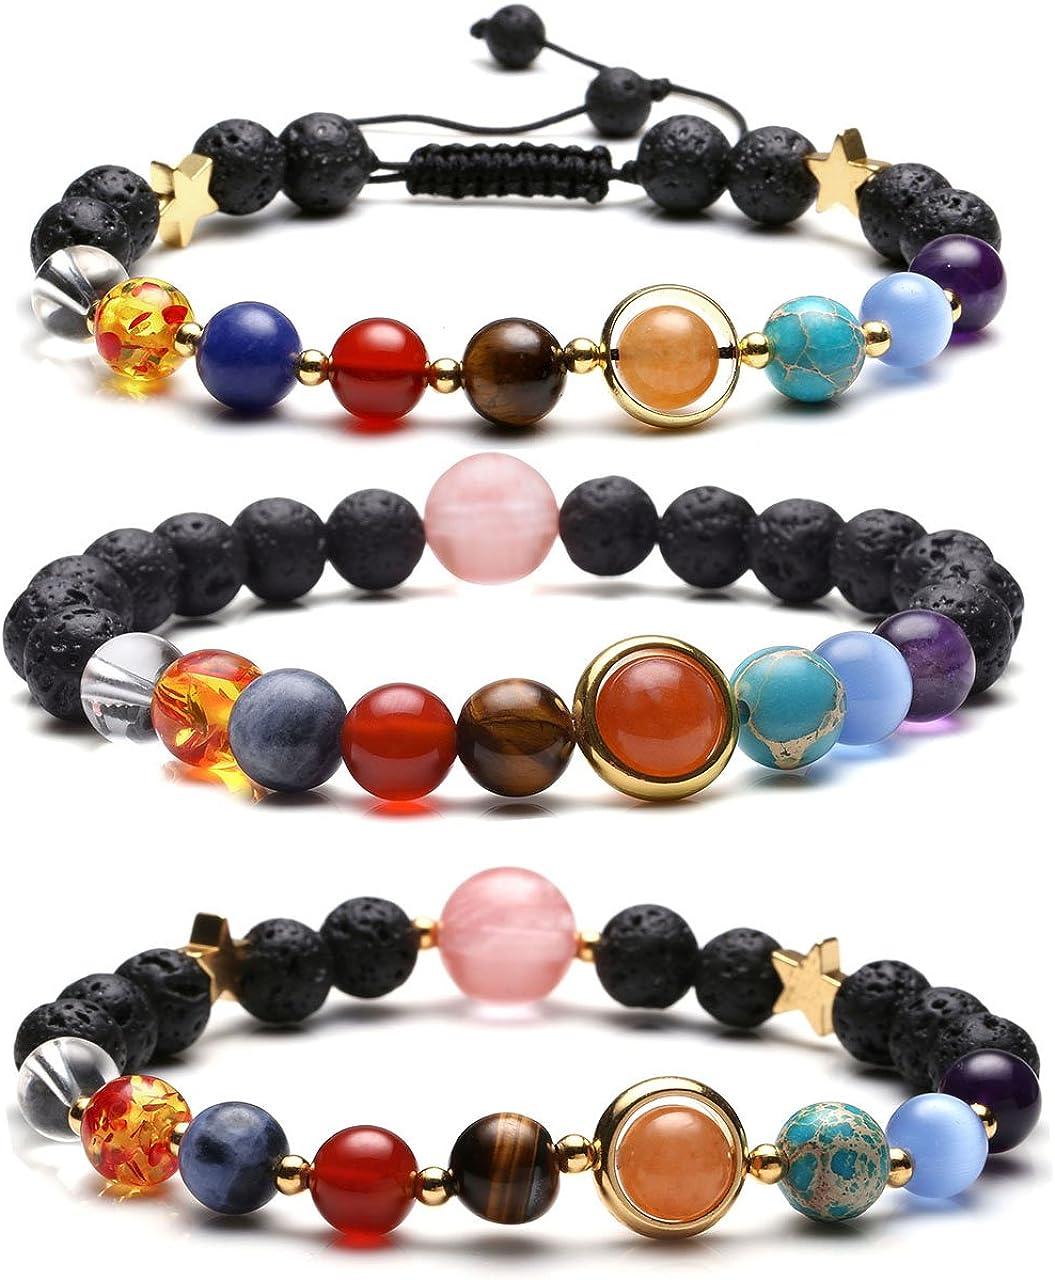 Jovivi Solar System Bracelet Universe Galaxy The Nine Planets Natural Lava Rock Beads Essentional Oil Diffuser Bracelet